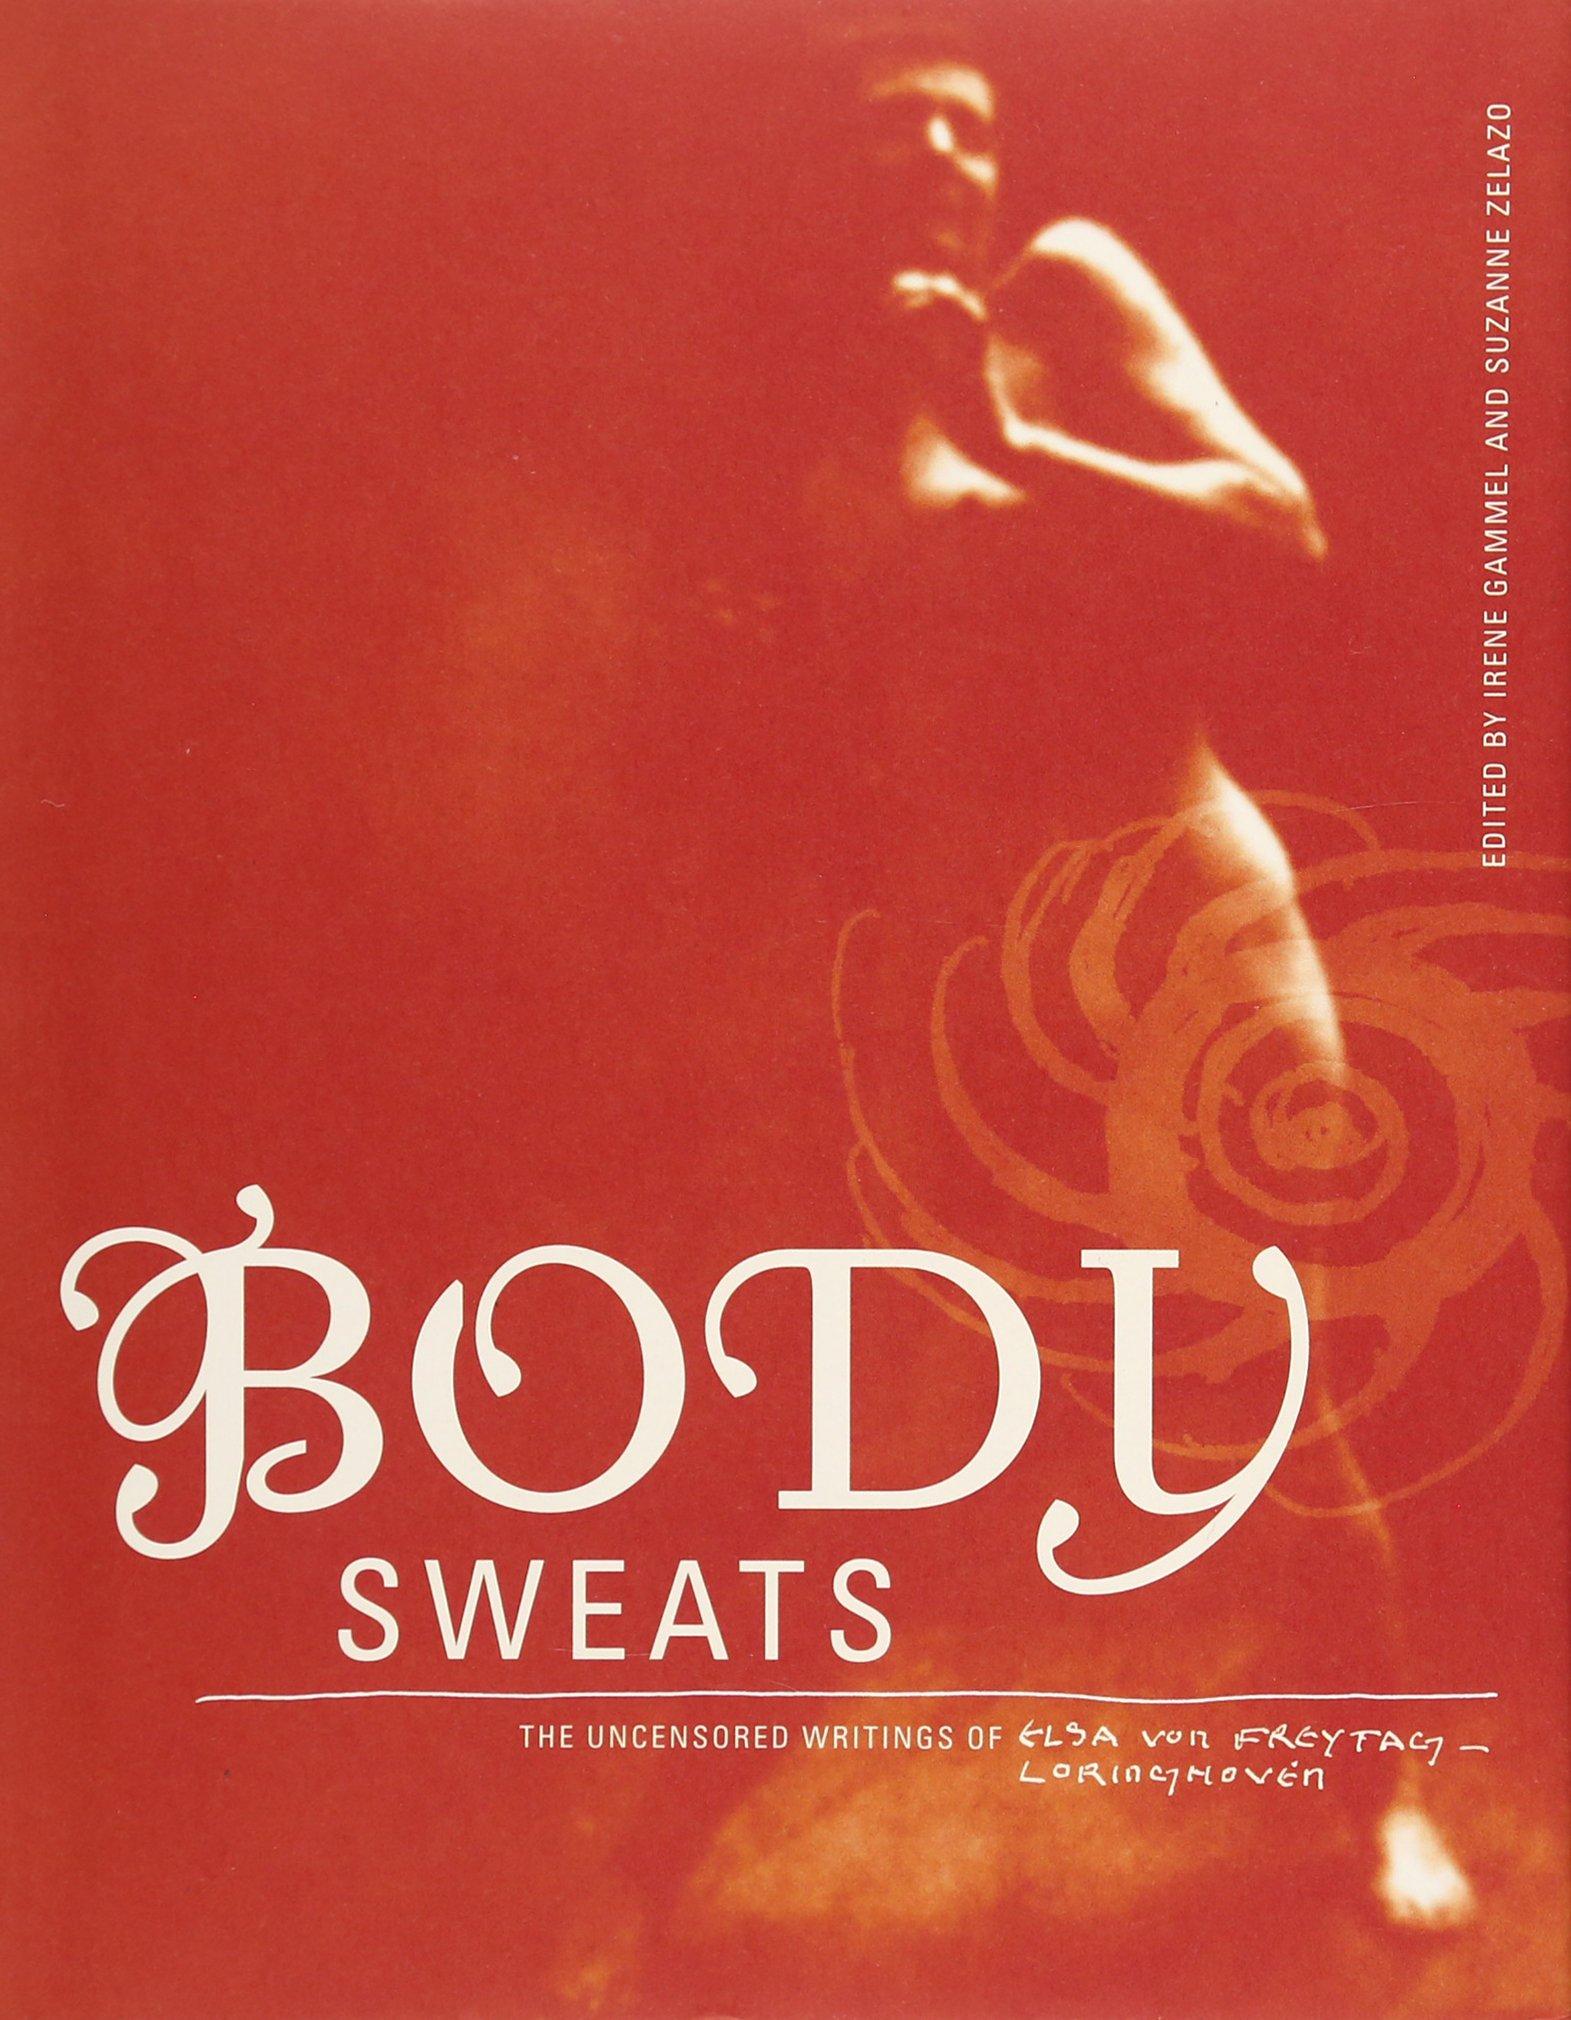 Body Sweats: The Uncensored Writings of Elsa von Freytag-Loringhoven (The MIT Press) pdf epub